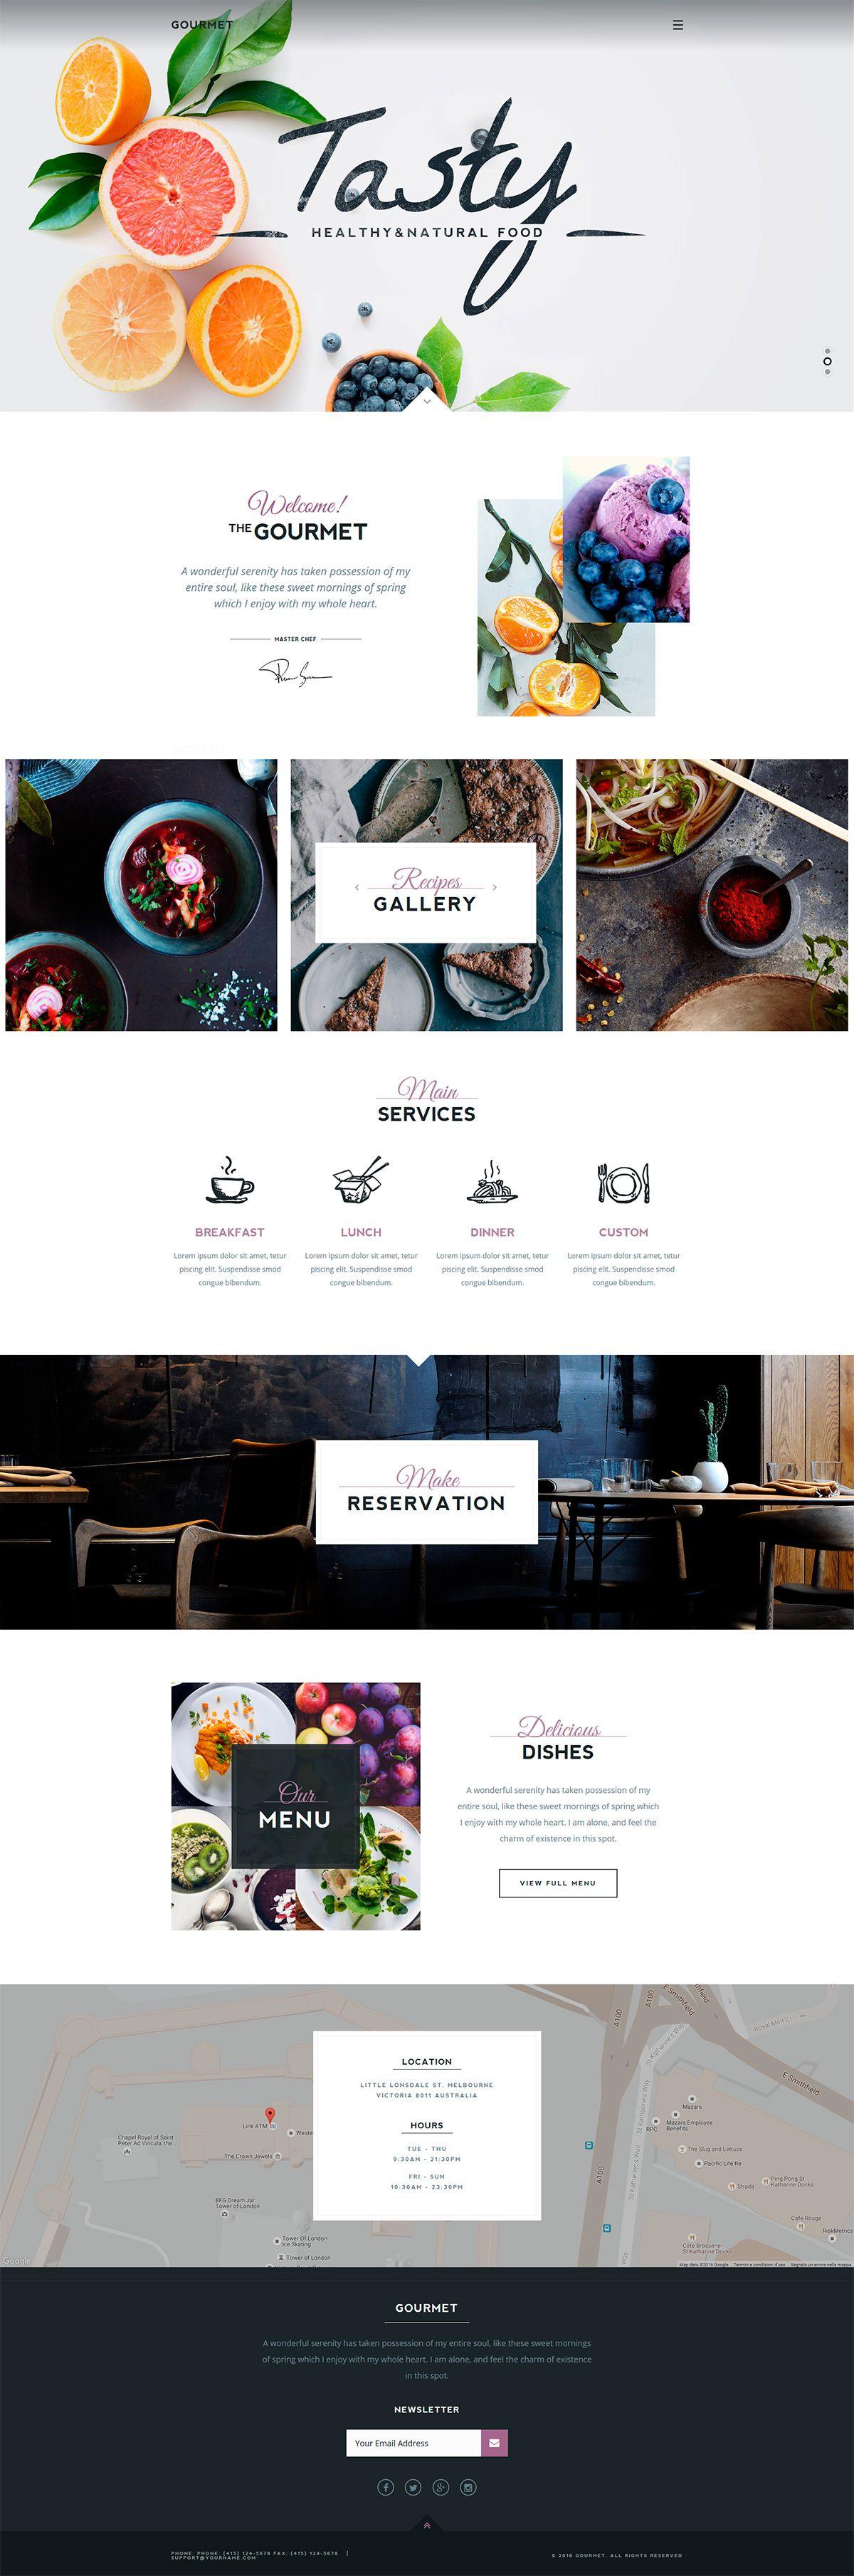 Gourmet restaurant cafe wordpress theme website